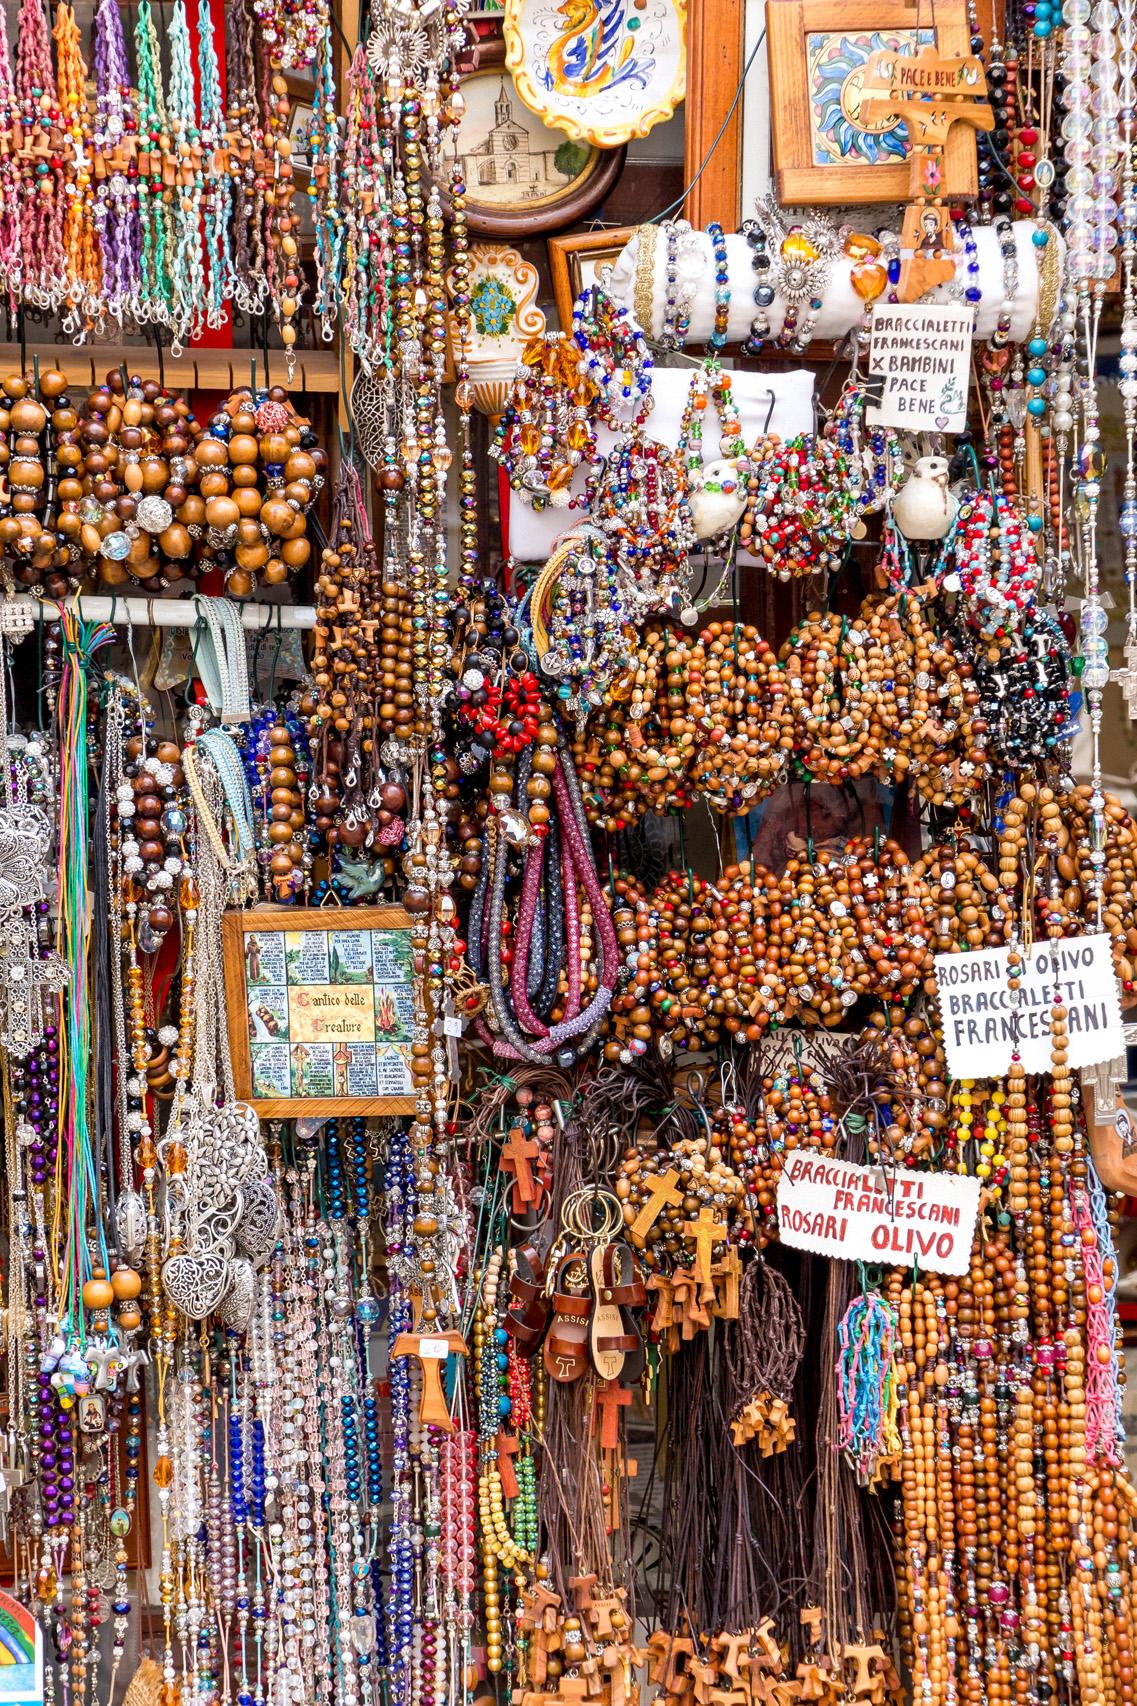 Souvenir shops in Assisi